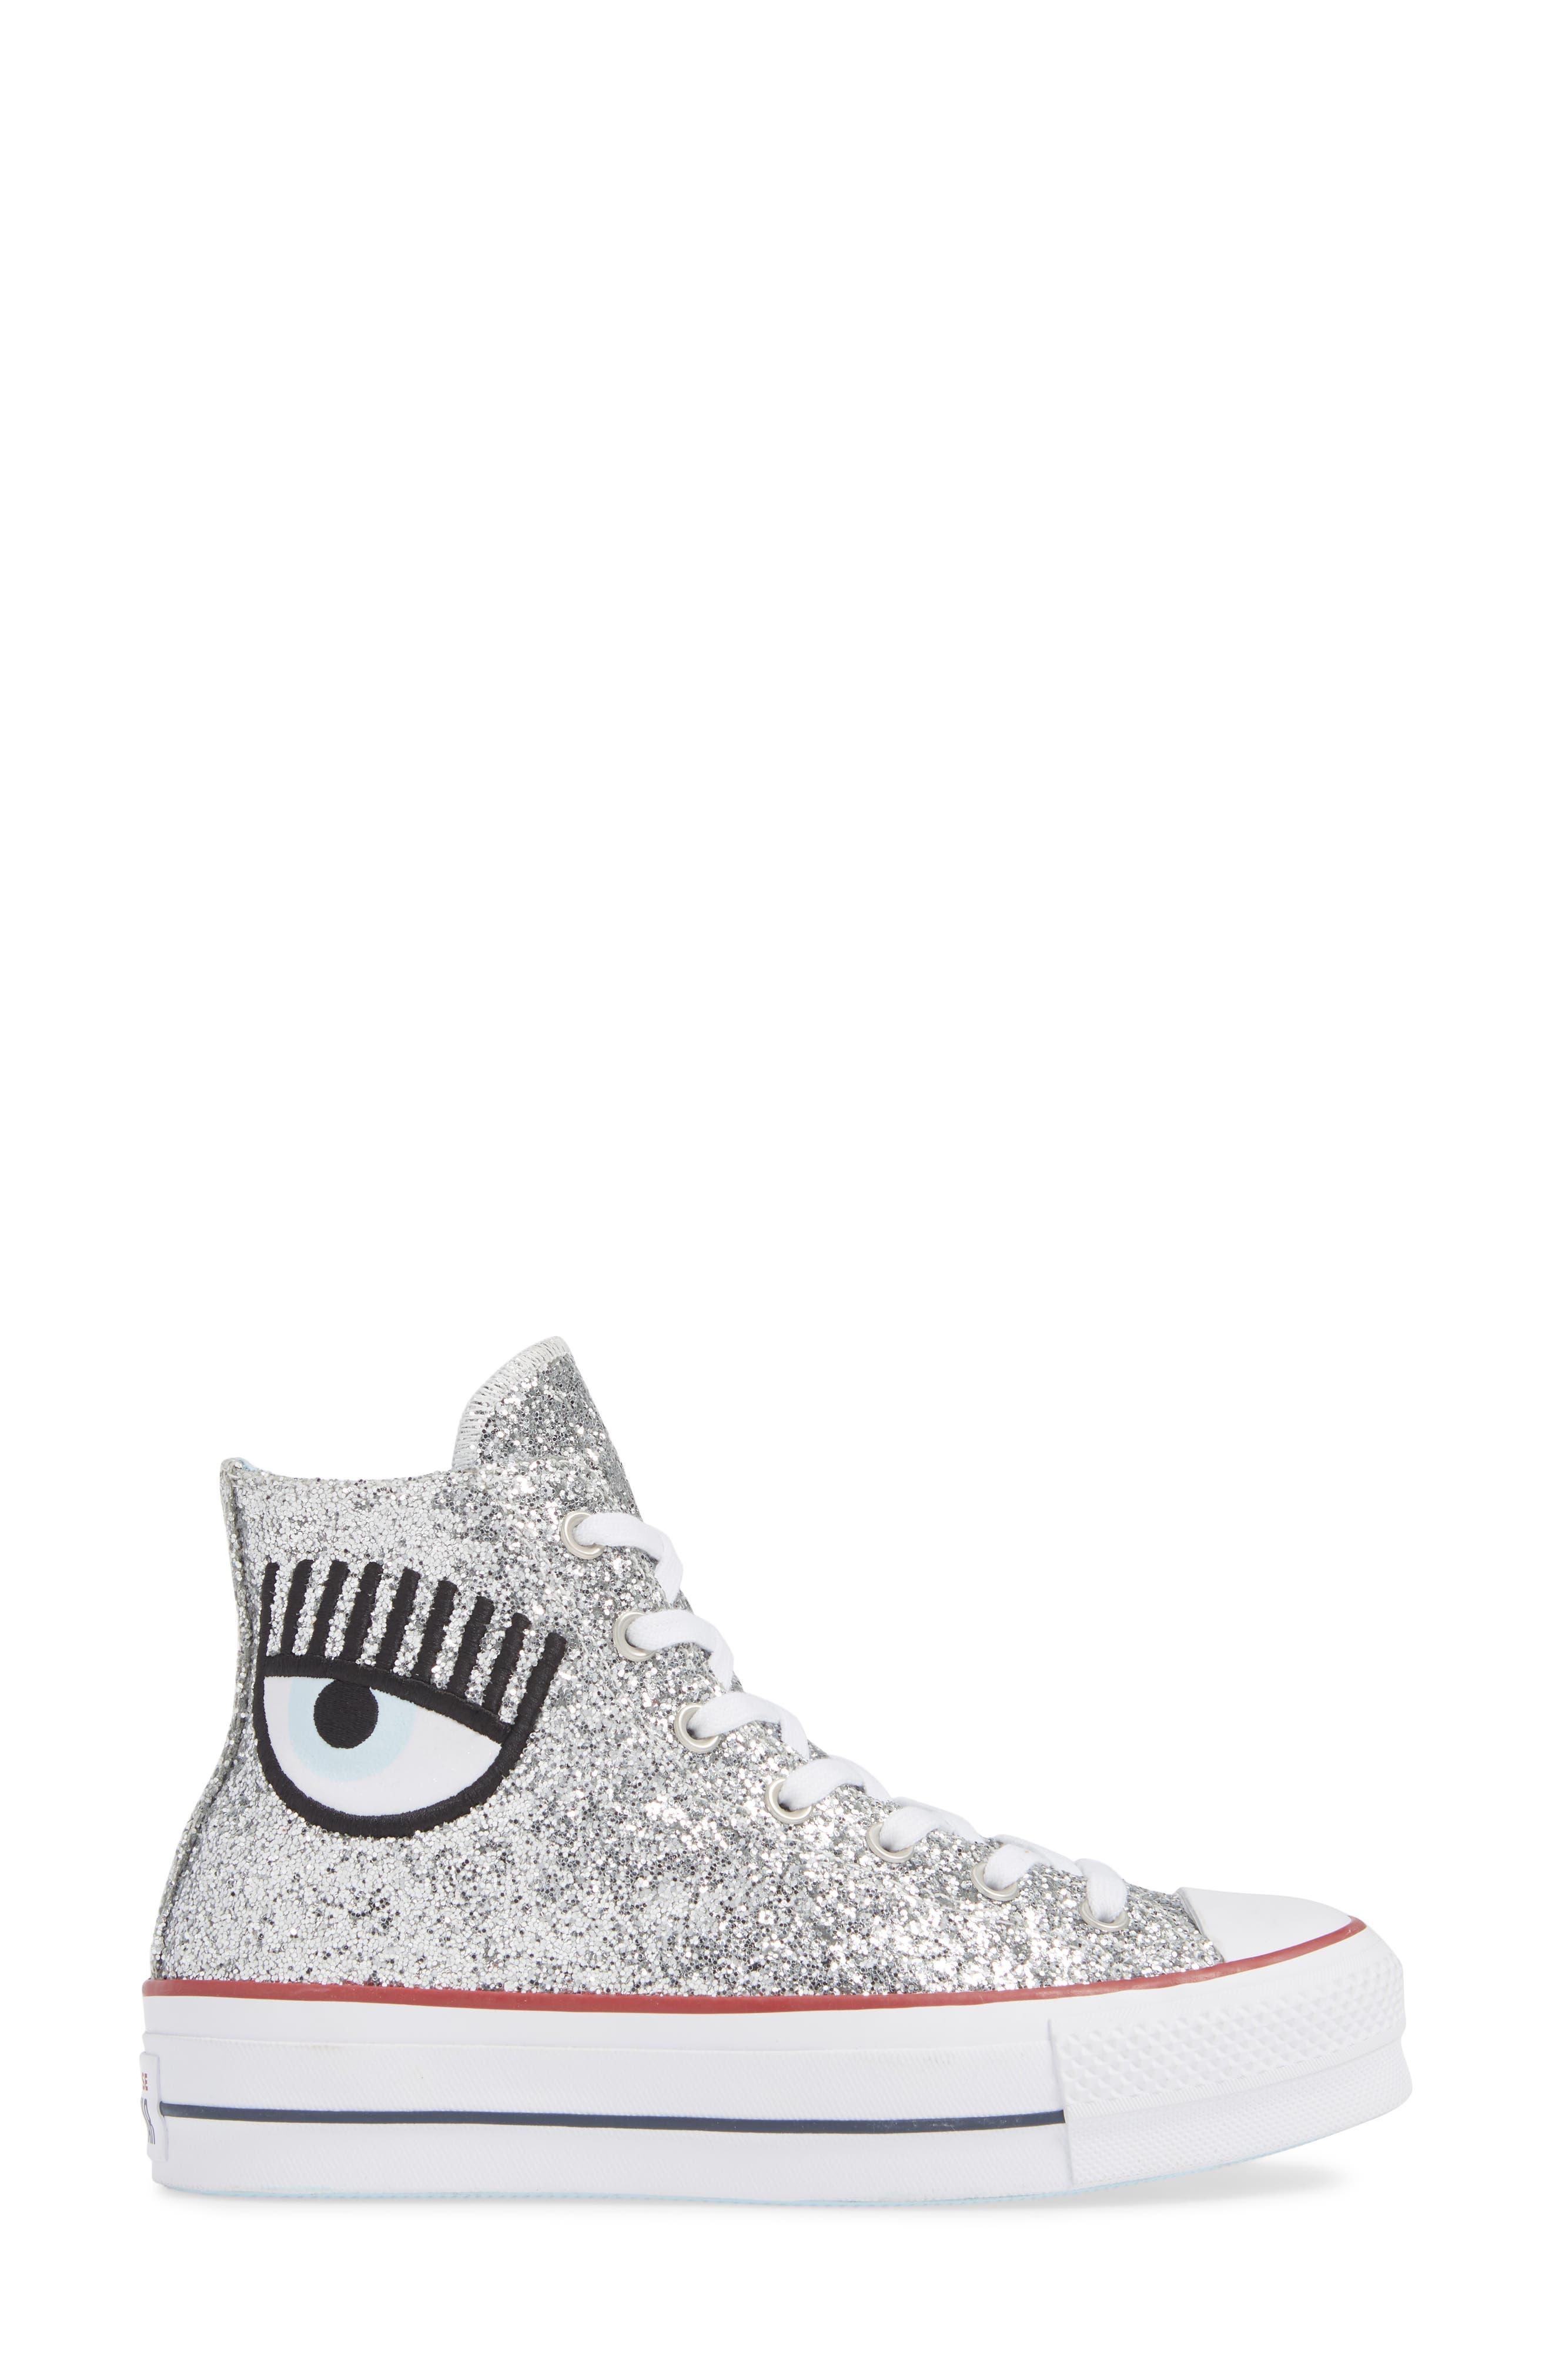 CONVERSE,                             x Chiara Ferragni 70 Hi One Star Glitter Platform Sneaker,                             Alternate thumbnail 3, color,                             040